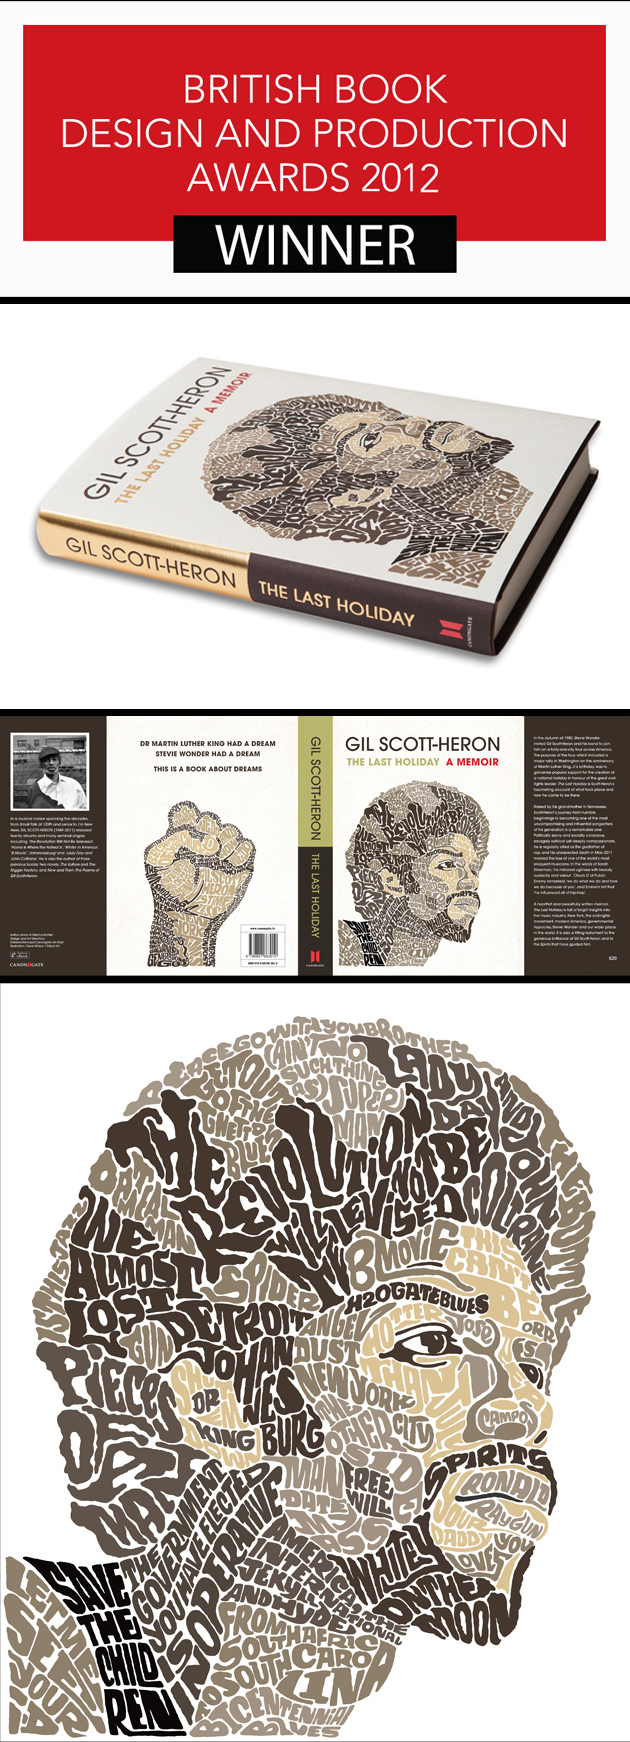 Oscar Wilson and Canongate Books Win Best Jacket Design Award